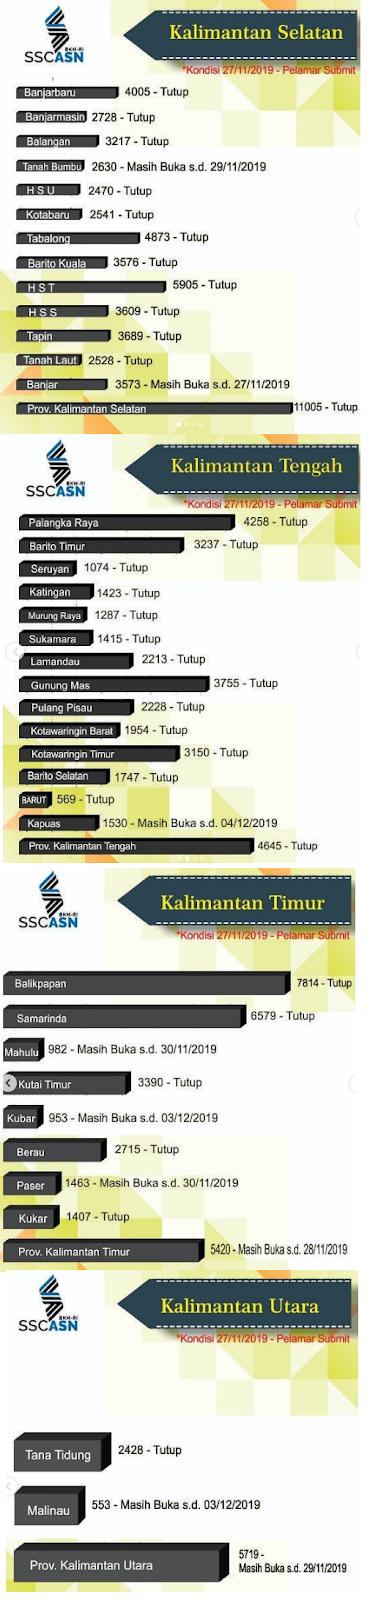 Jumlah pelamar CPNS 2019 wilayah kalimantan 2019